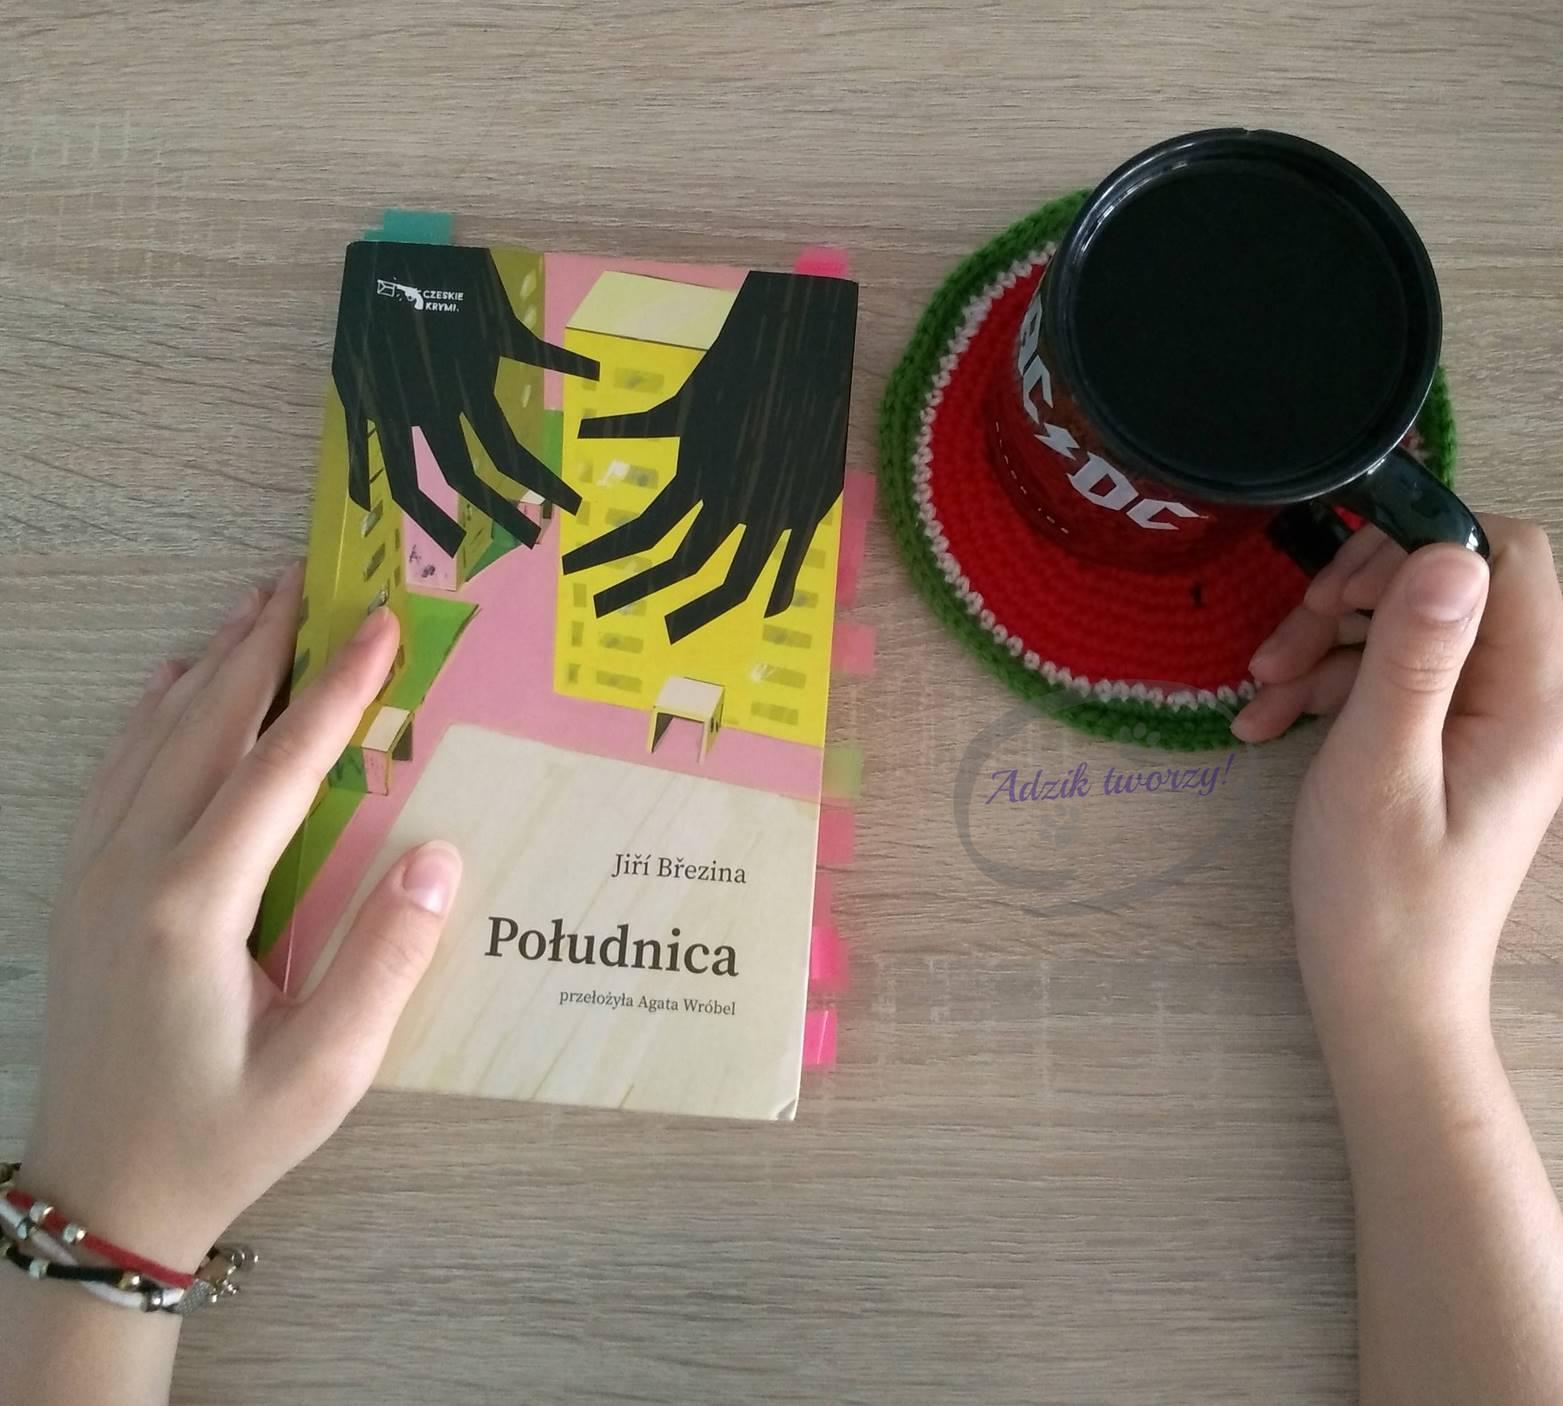 Book Tour: Południca - Jiří Březina. Recenzja książki